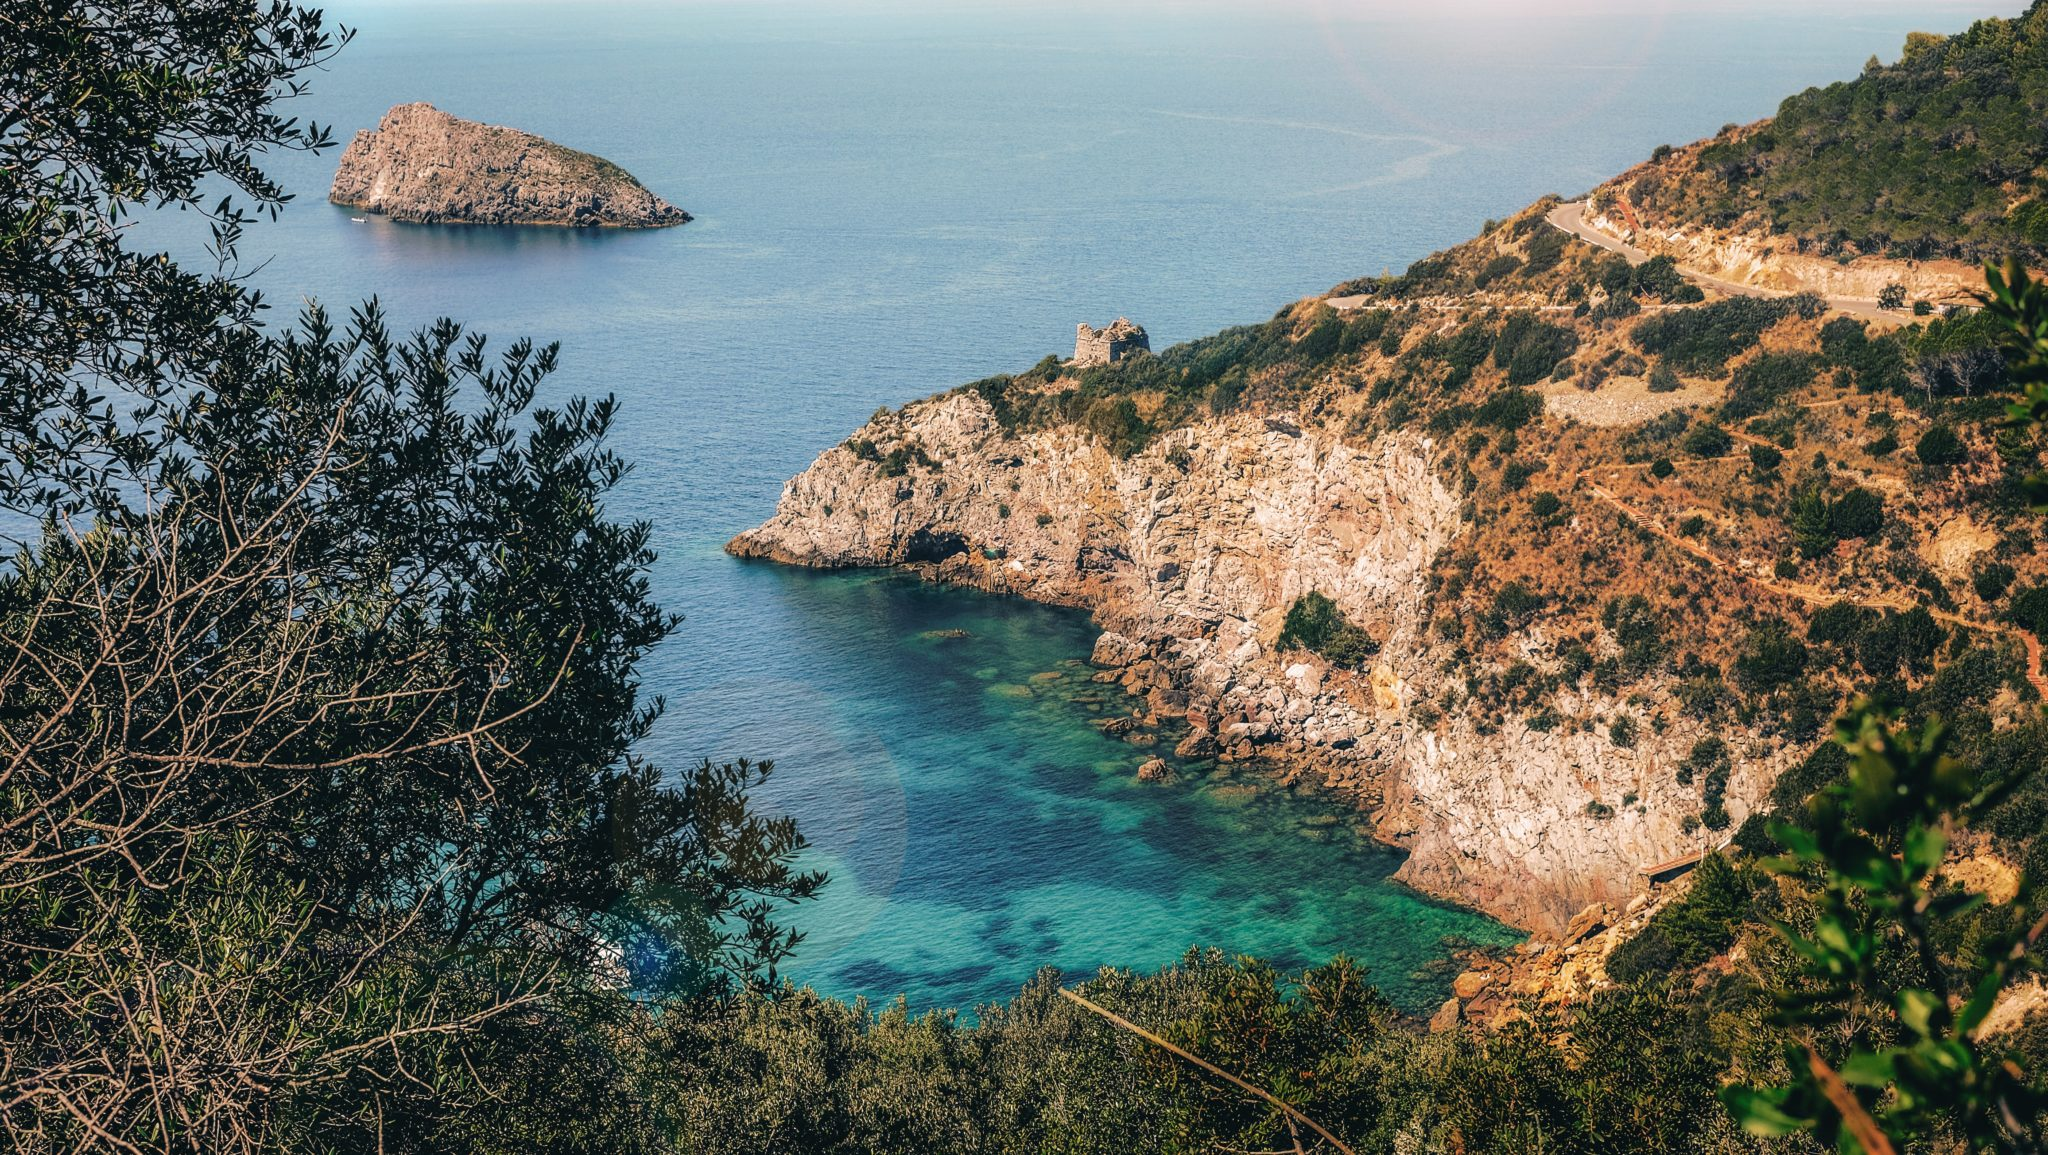 Die Bucht Cala del Gesso auf der Halbinsel Monte Argentario